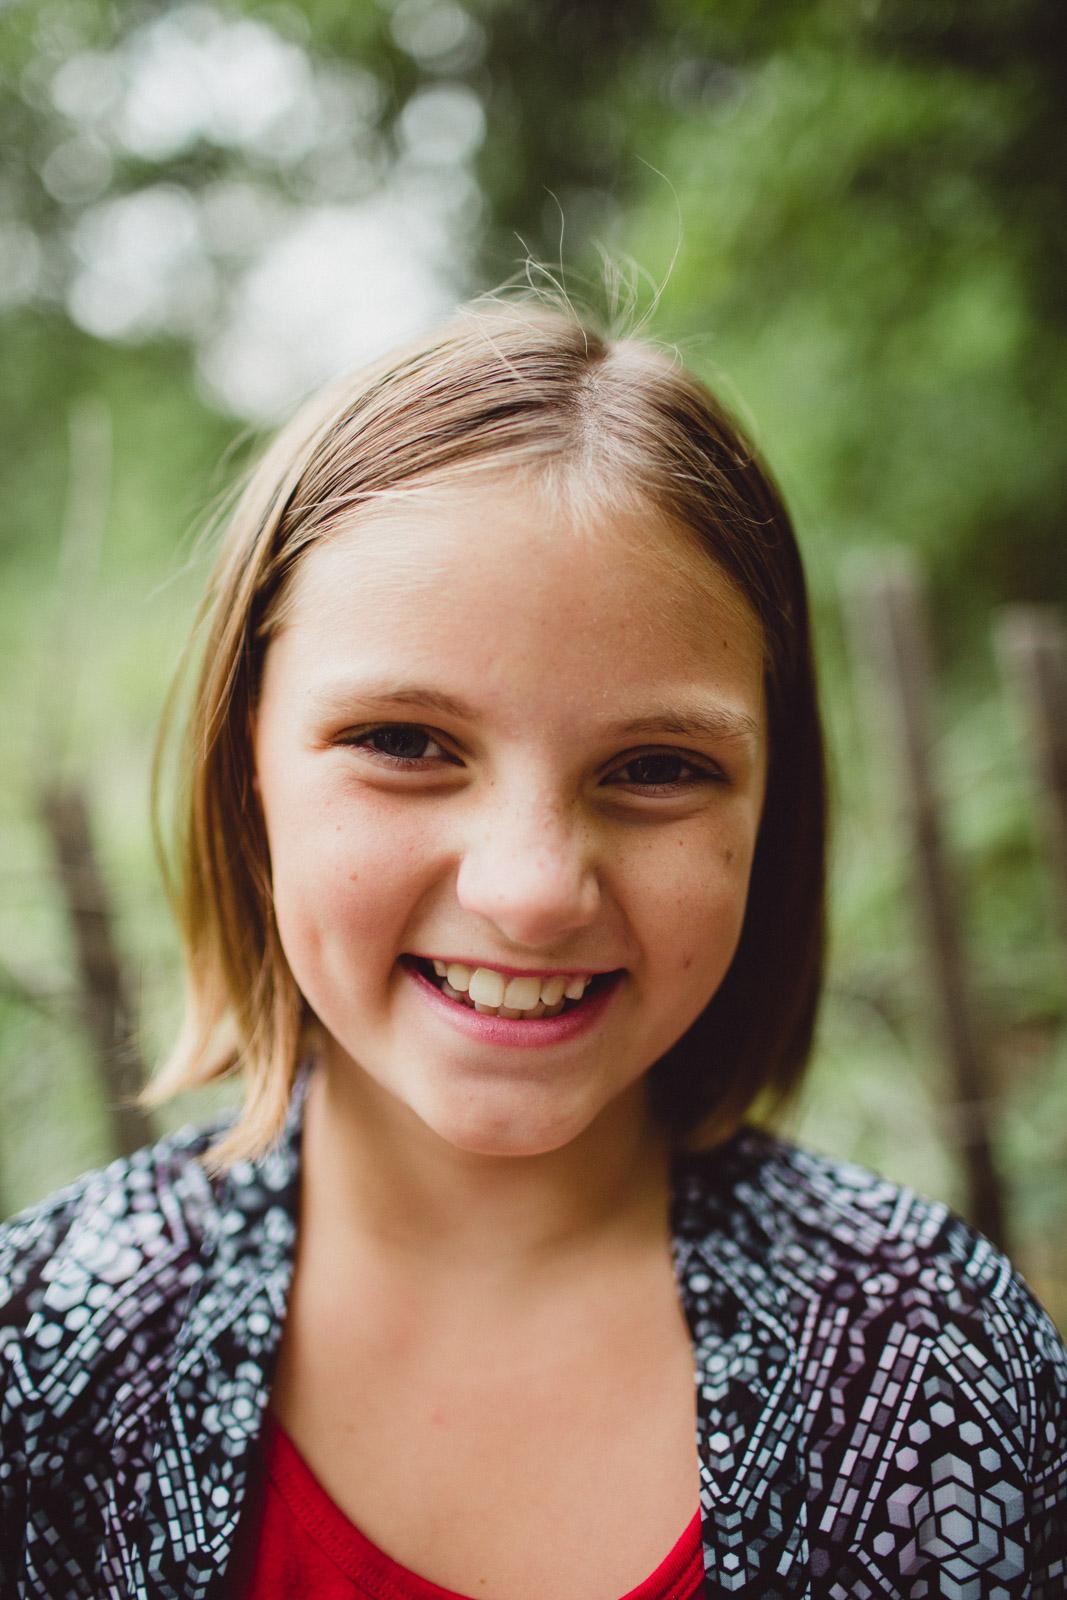 close-up portrait of young girl, joyful